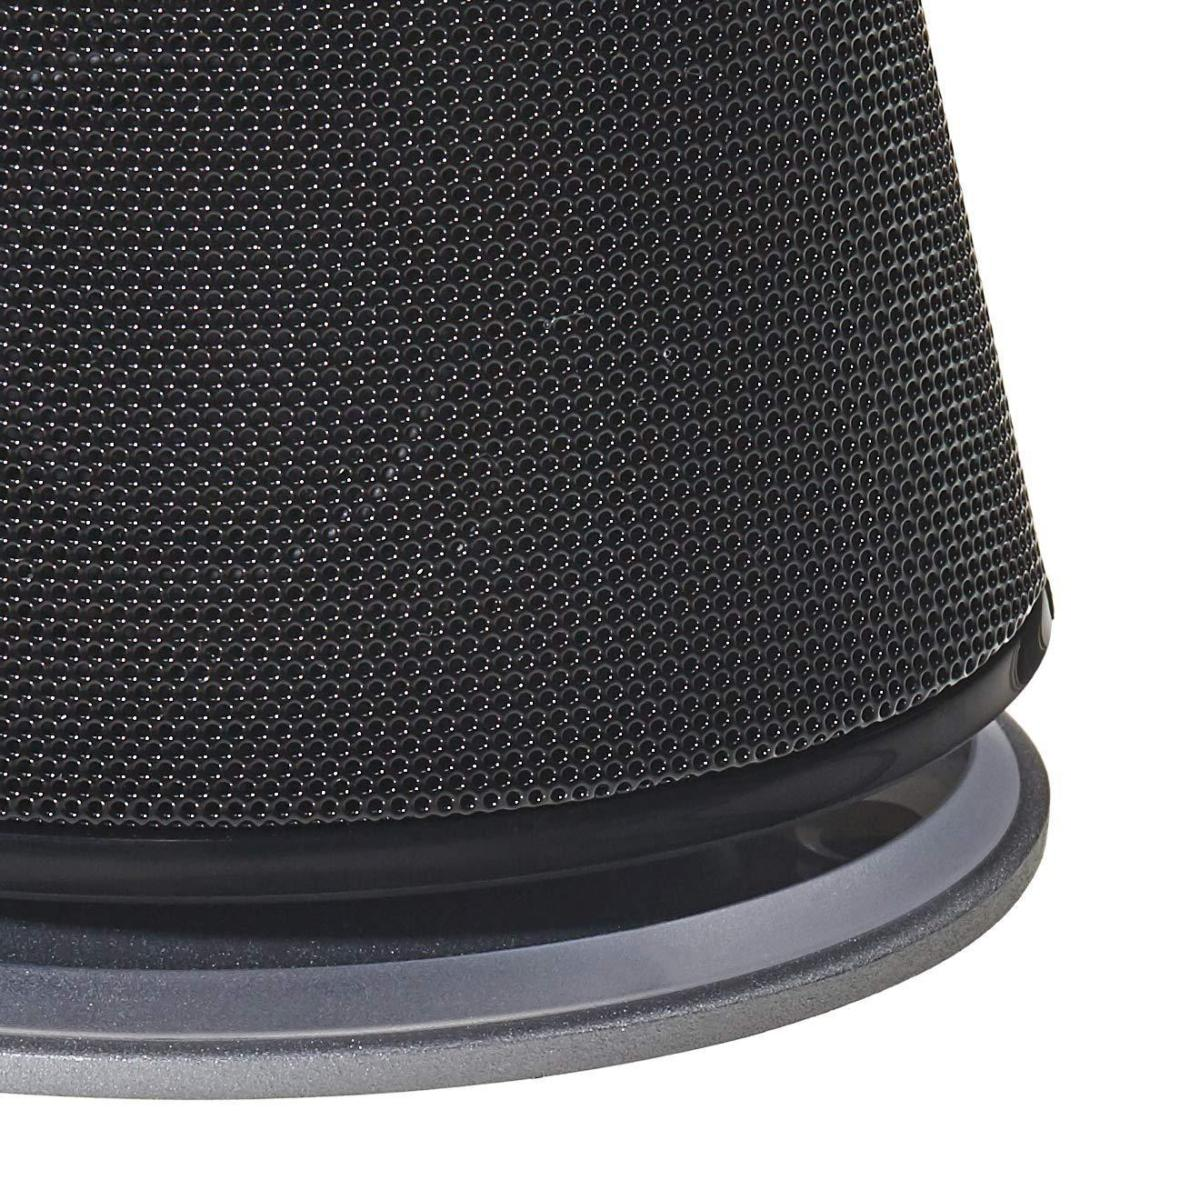 amazonbasics usb powered computer speakers detail bottom